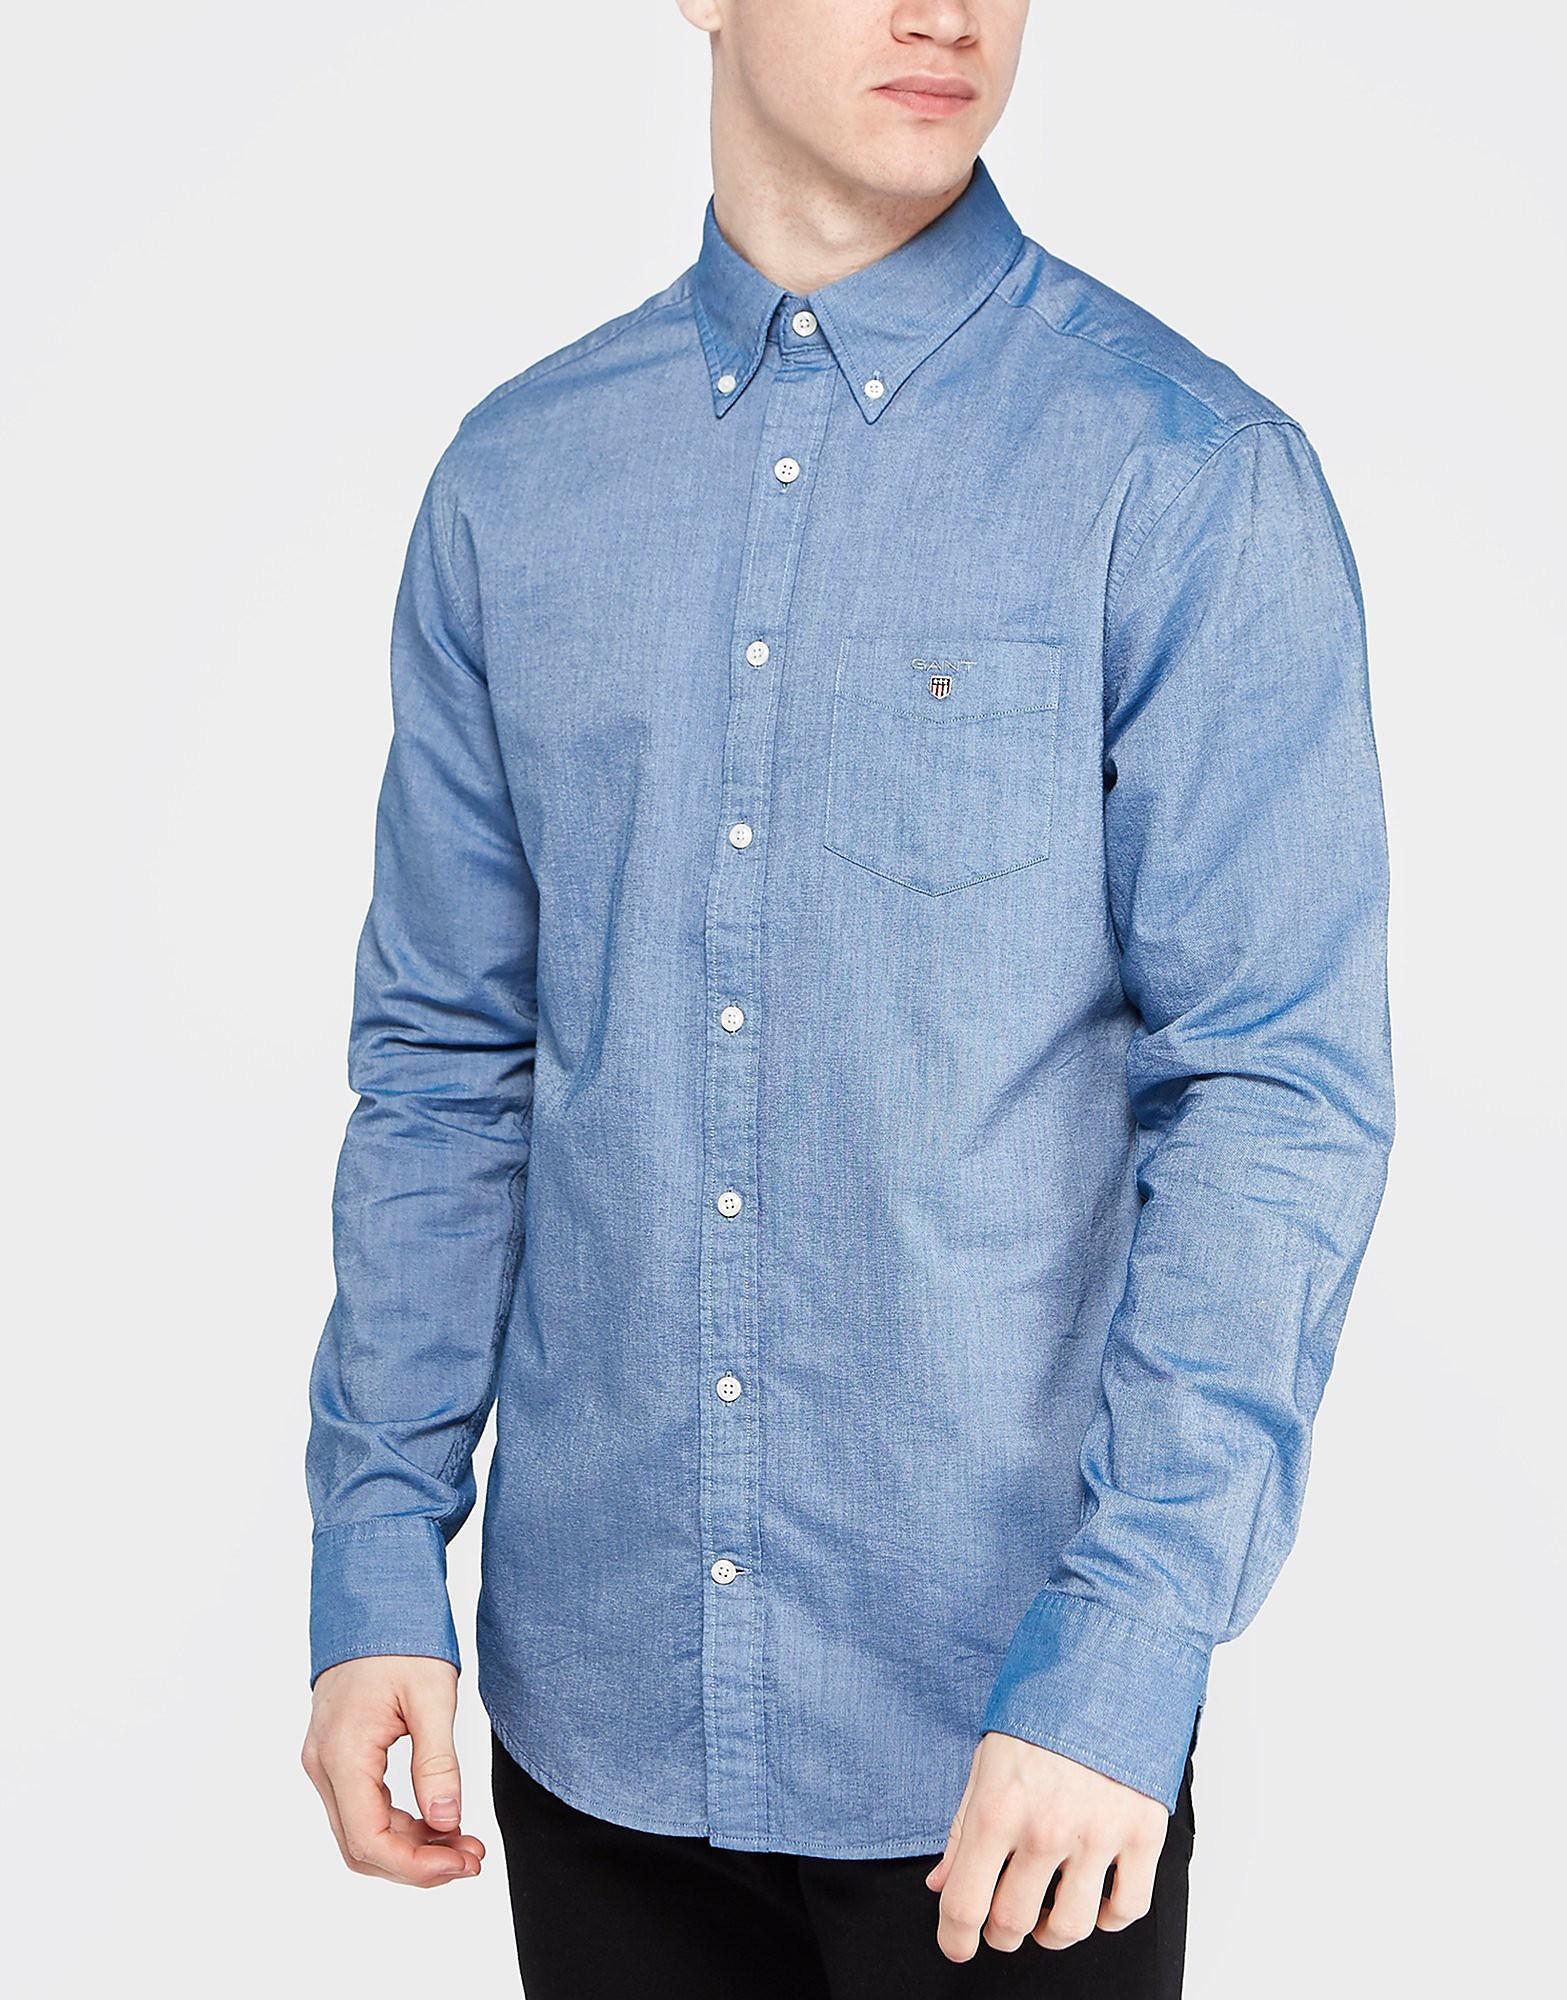 GANT Long Sleeve Chambray Shirt